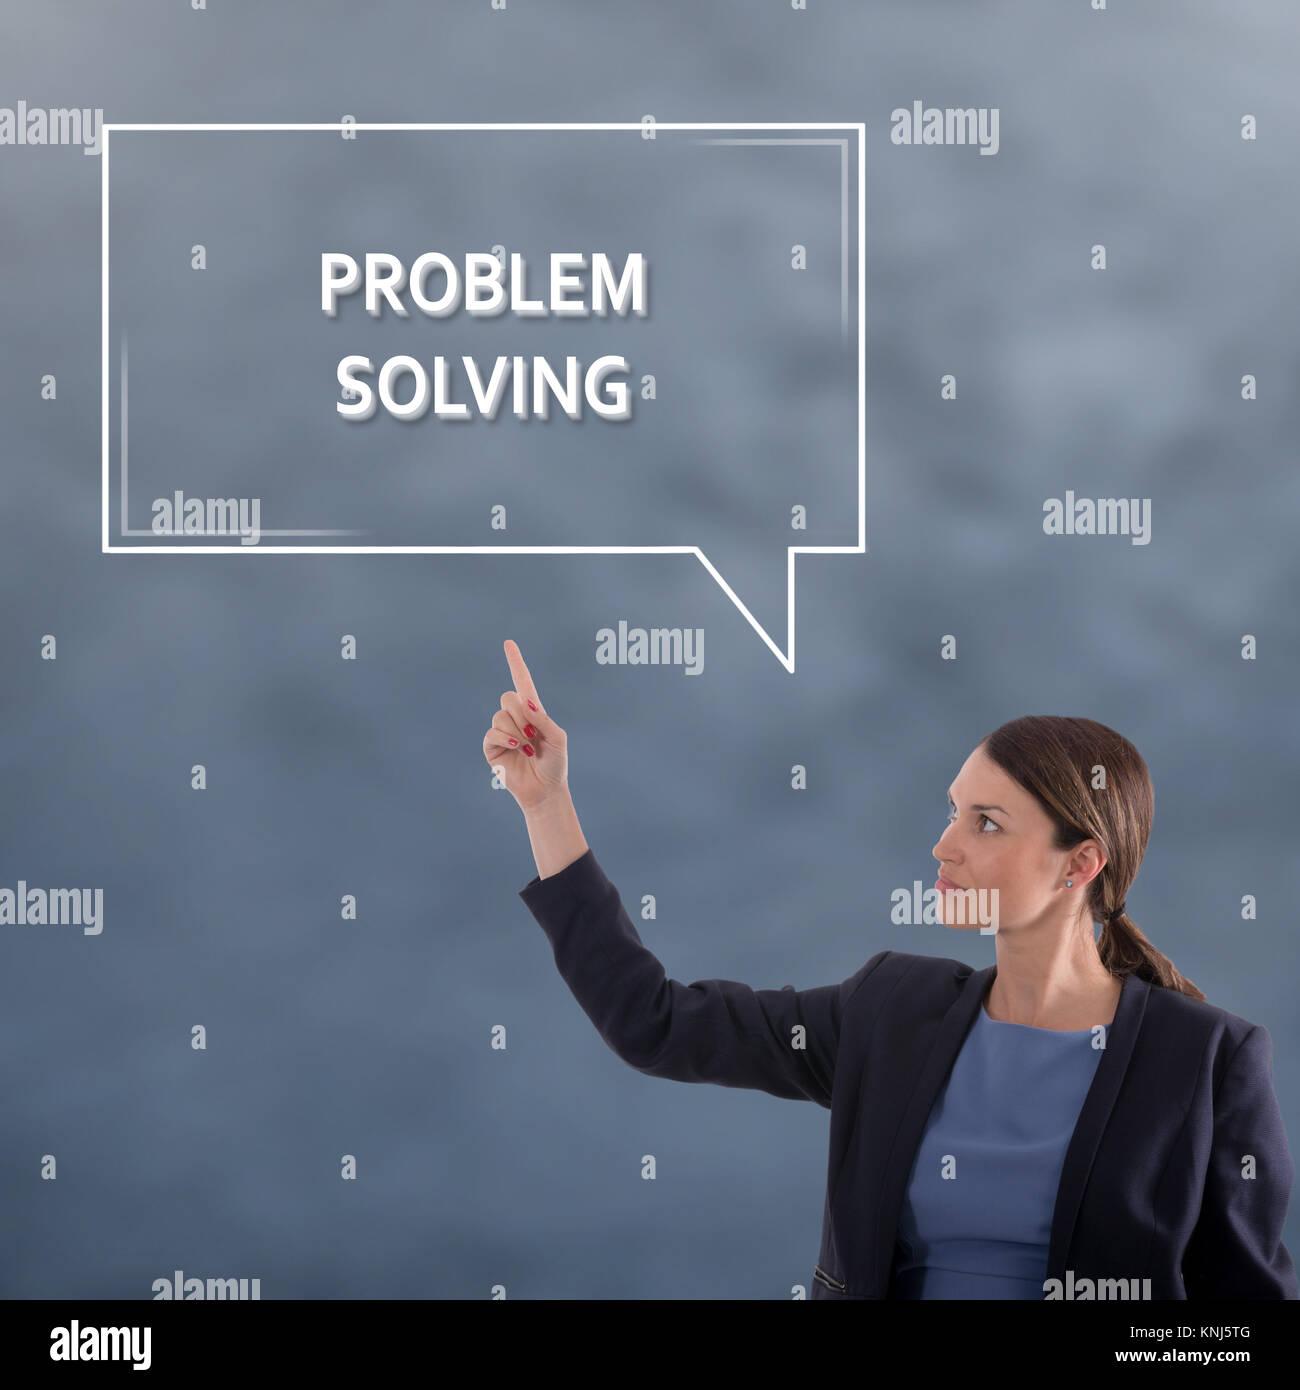 PROBLEM SOLVING Business Concept. Business Woman Graphic Concept - Stock Image